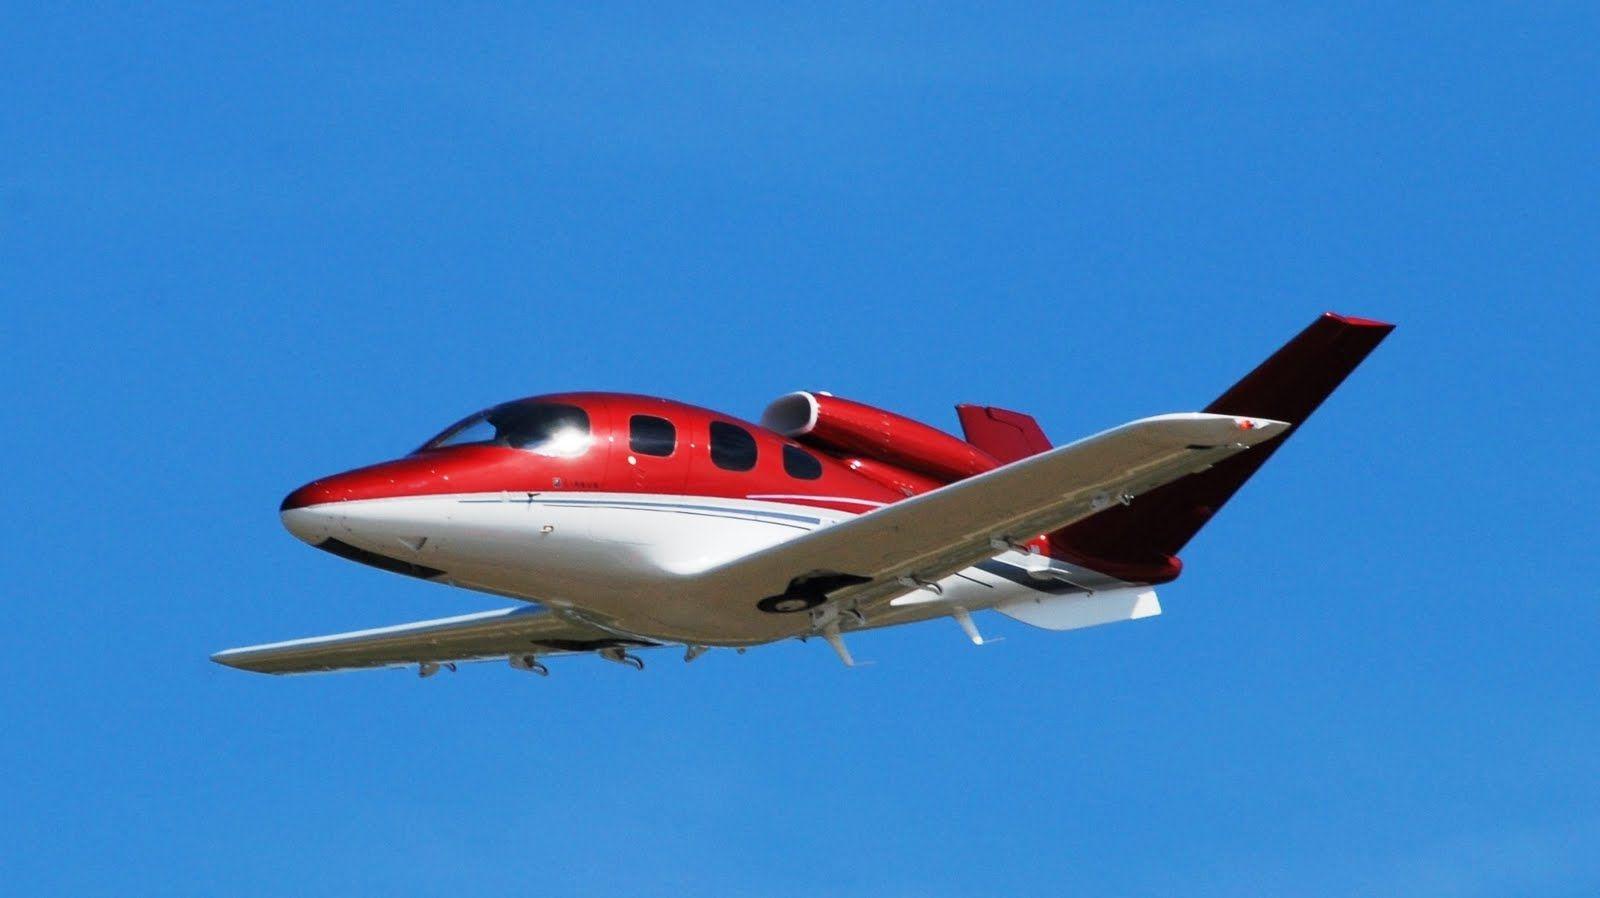 Cirrus Vision SF50 The Compact Jet Cirrus SR-20 read more →